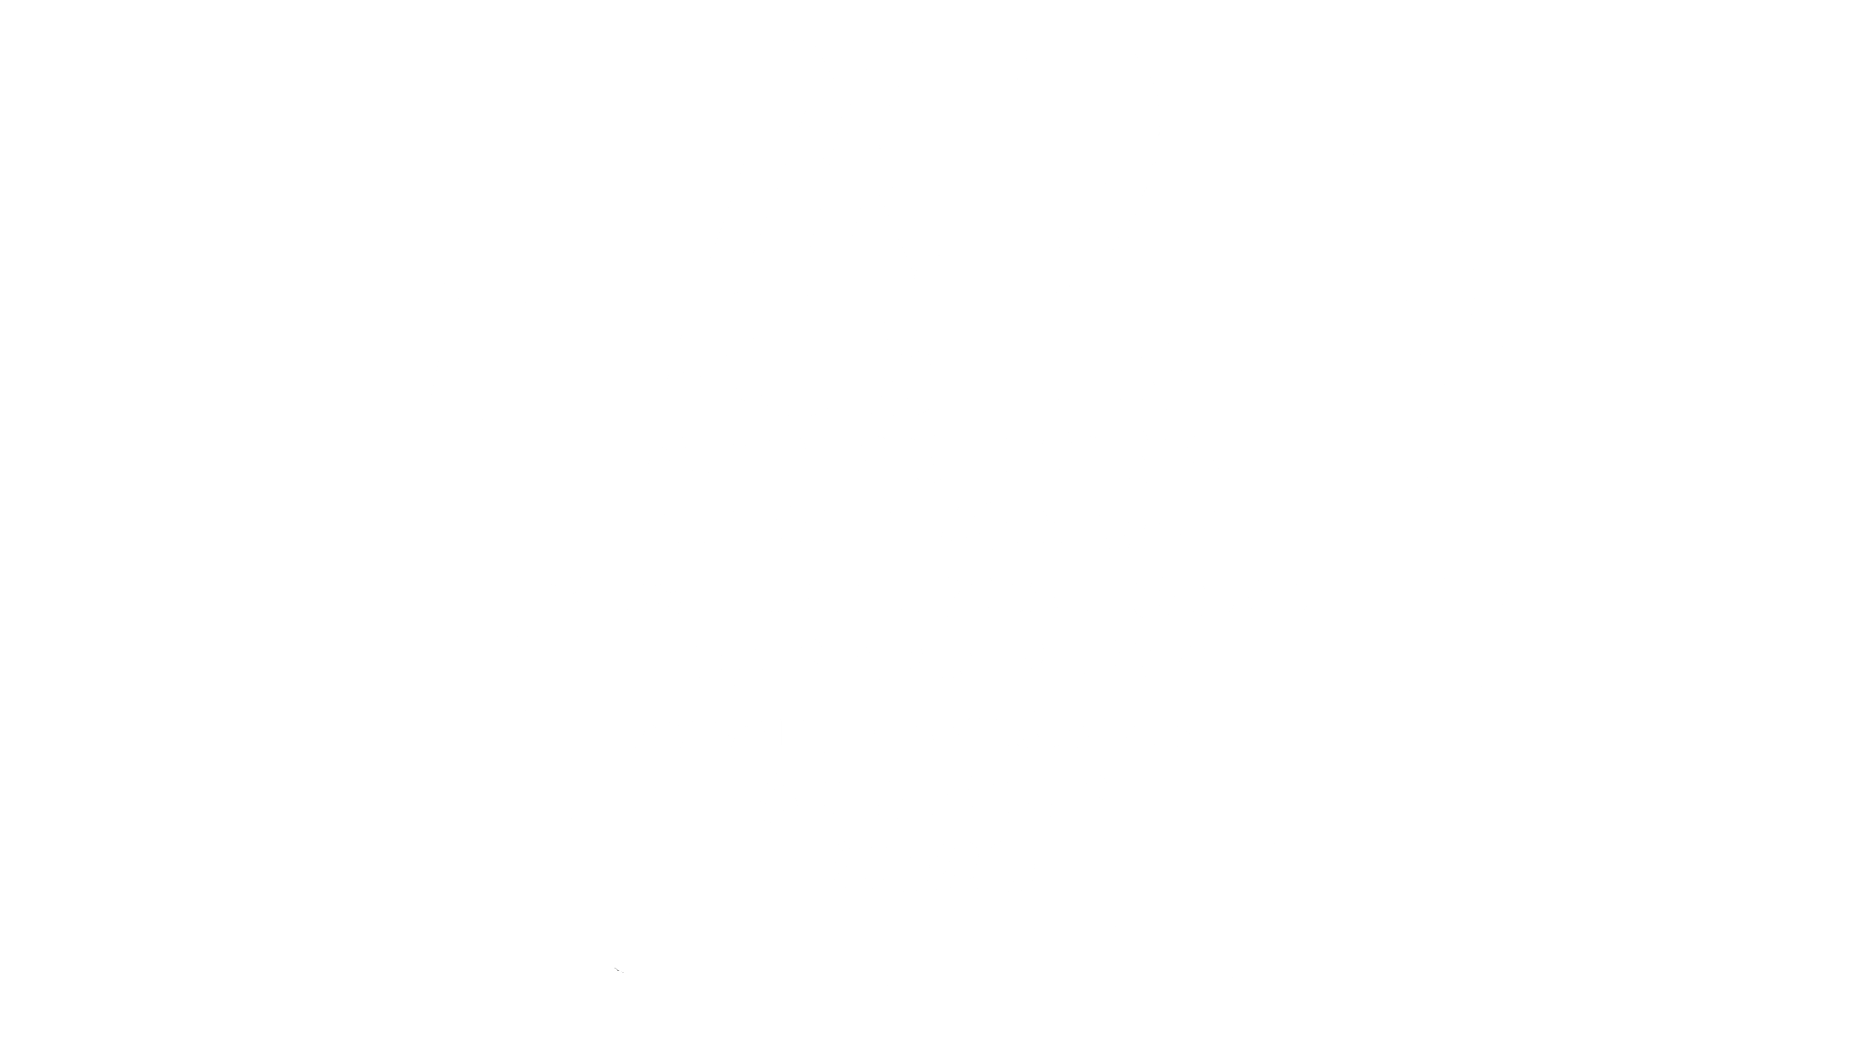 Best International Screenplay Austin After Dark Film Festival